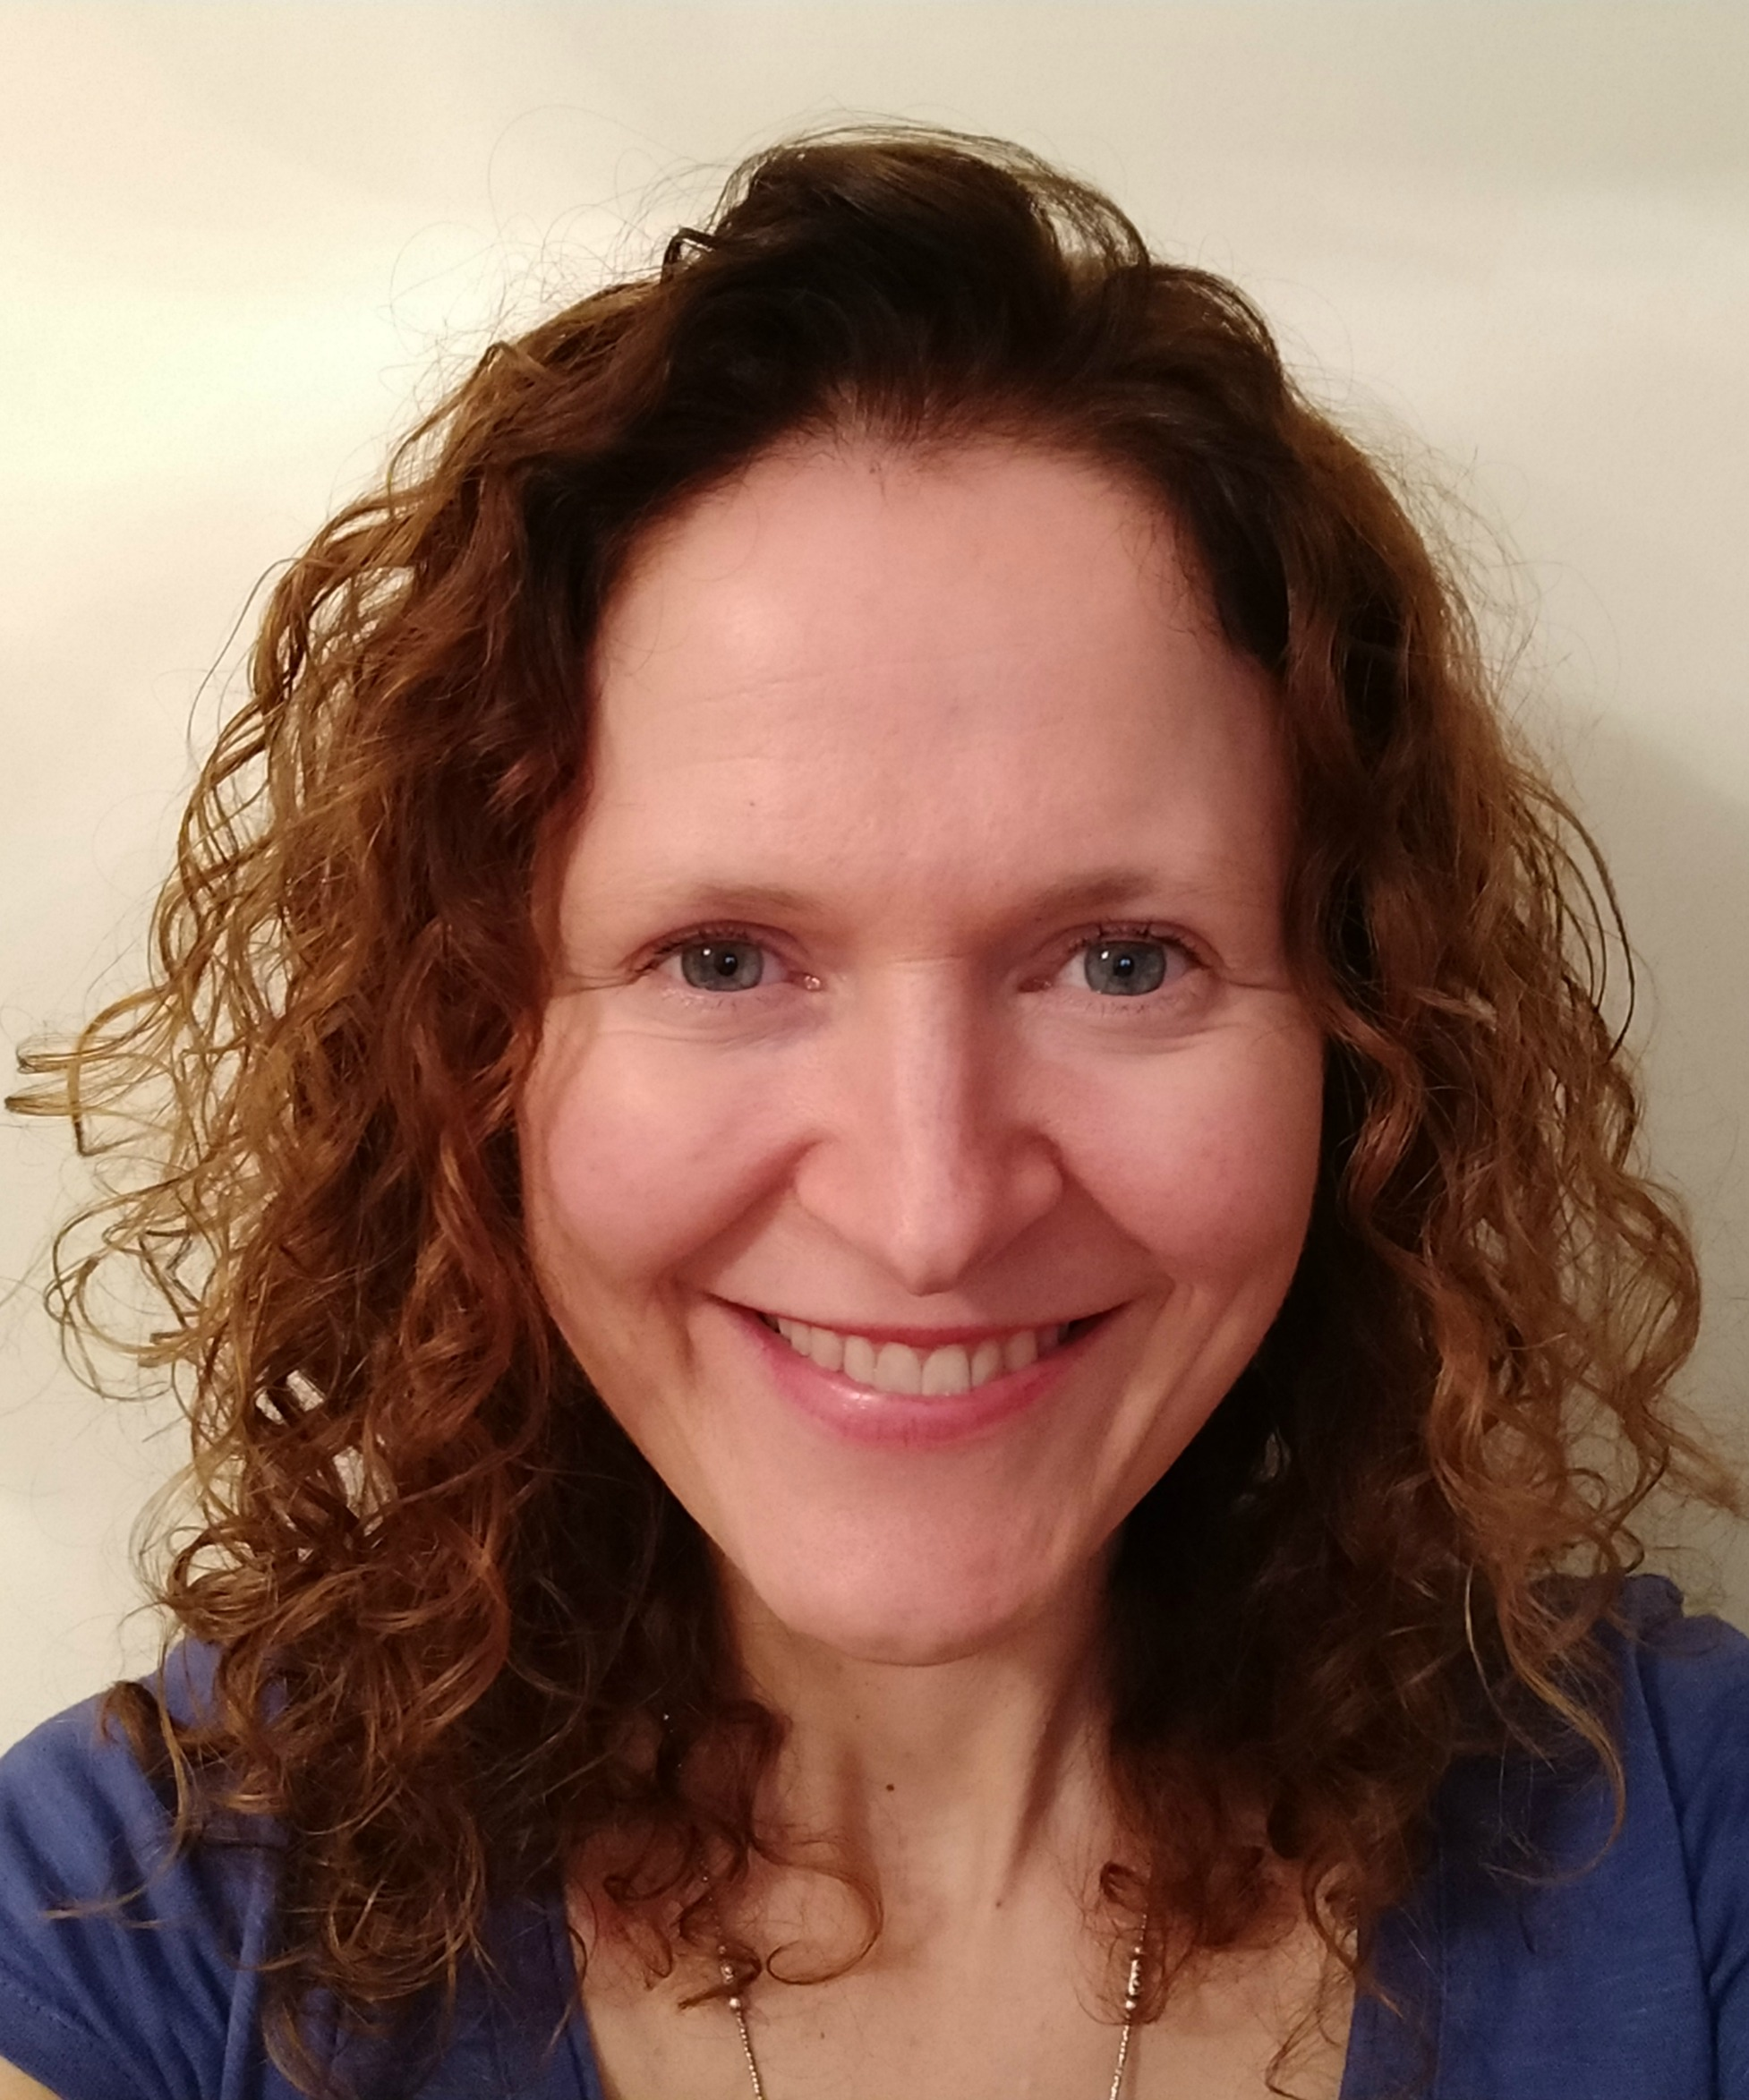 Rosemary Lowe